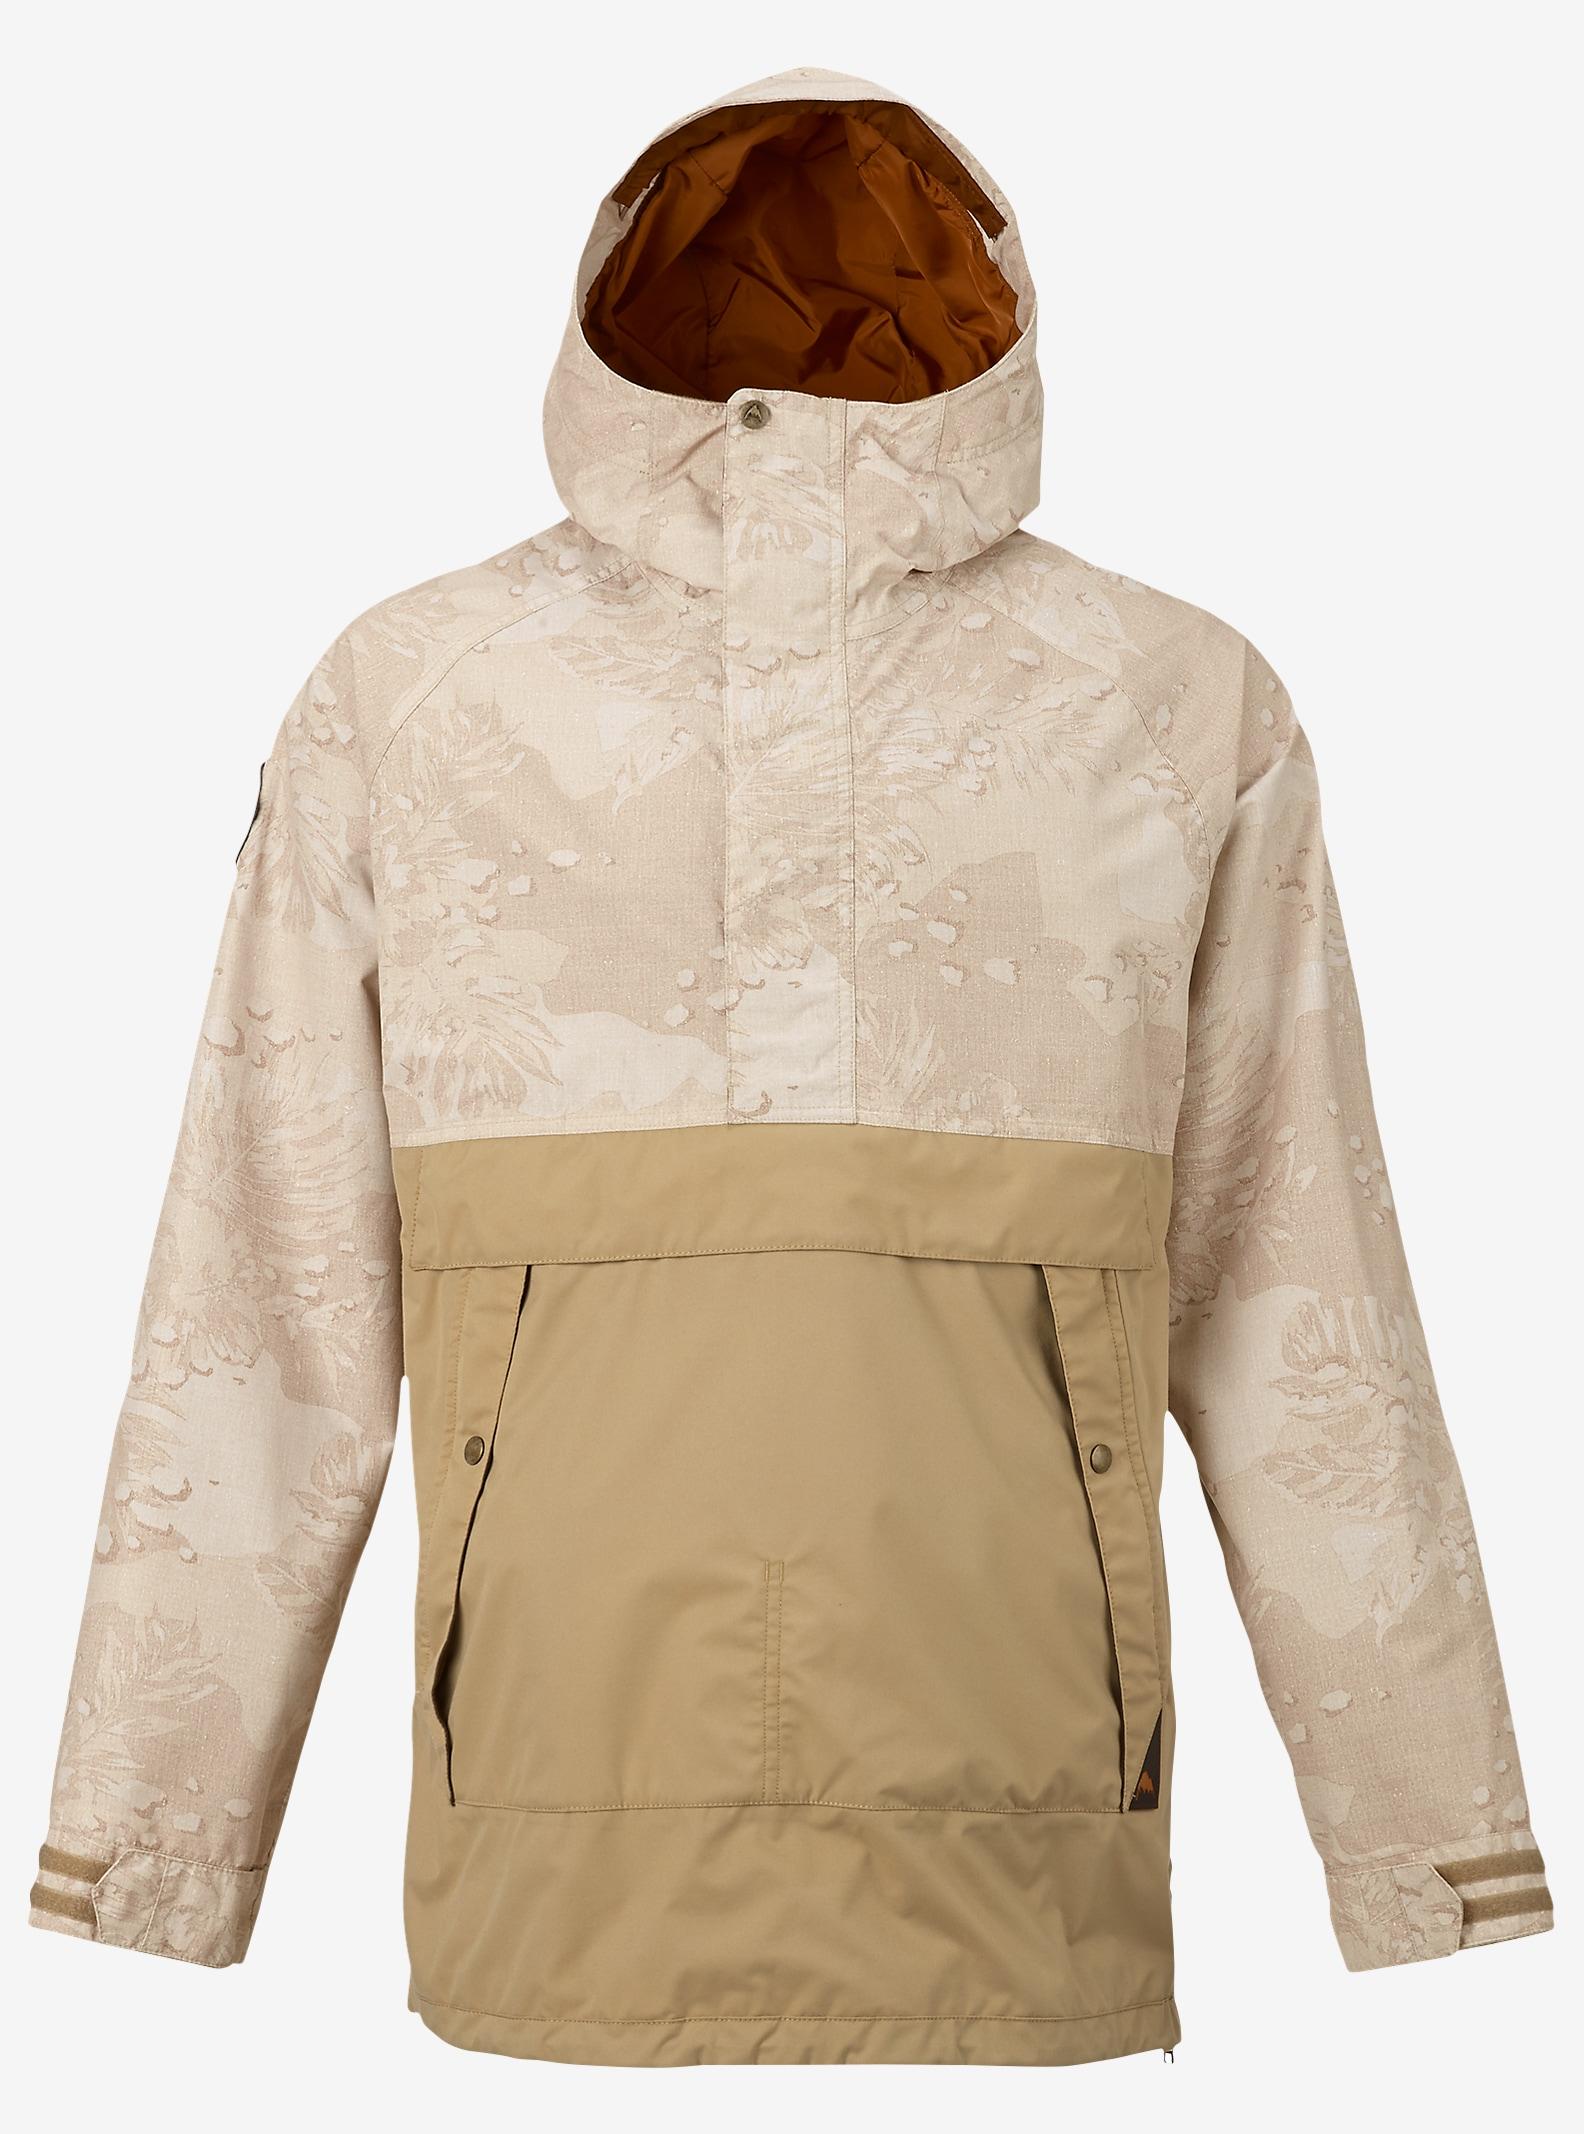 Burton Rambler Anorak Jacket shown in Hawaiian Desert / Kelp